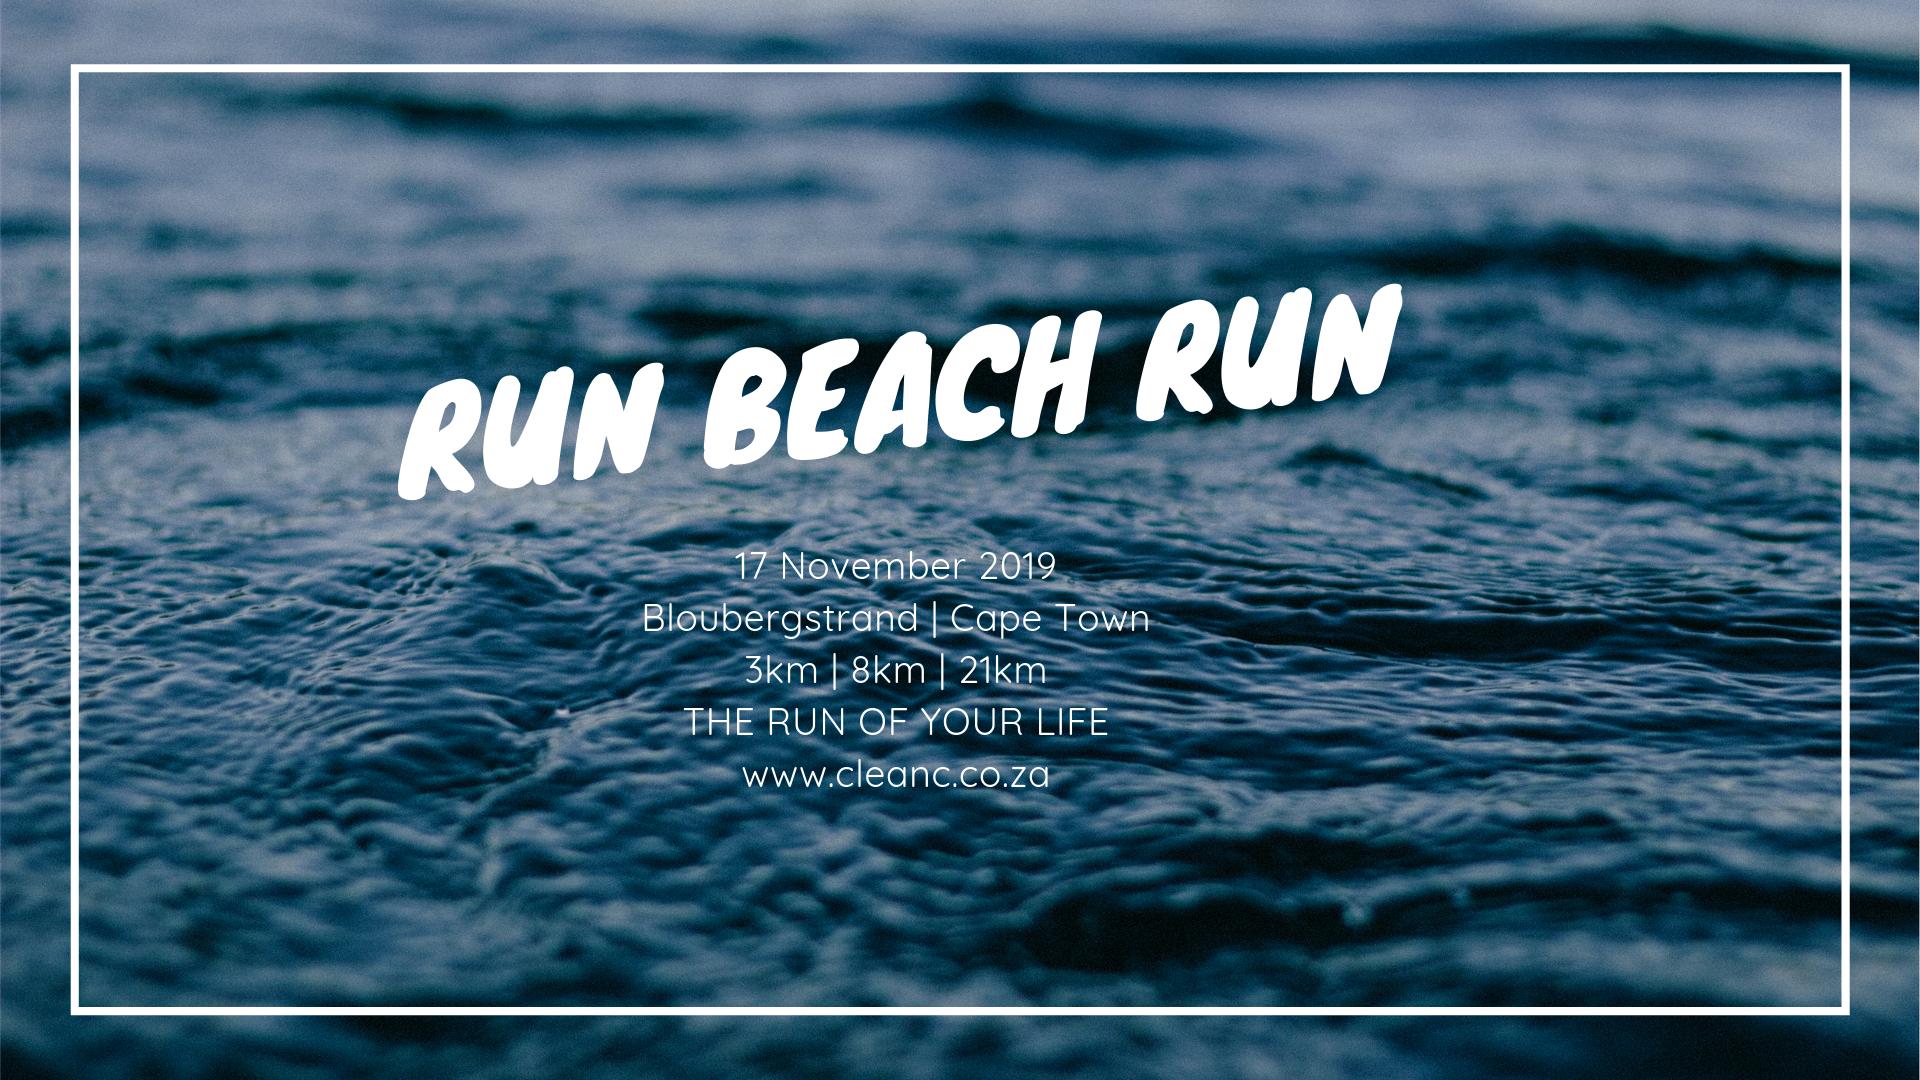 The Most Beautiful Beach Run in the World | Blouberg | 17 Nov